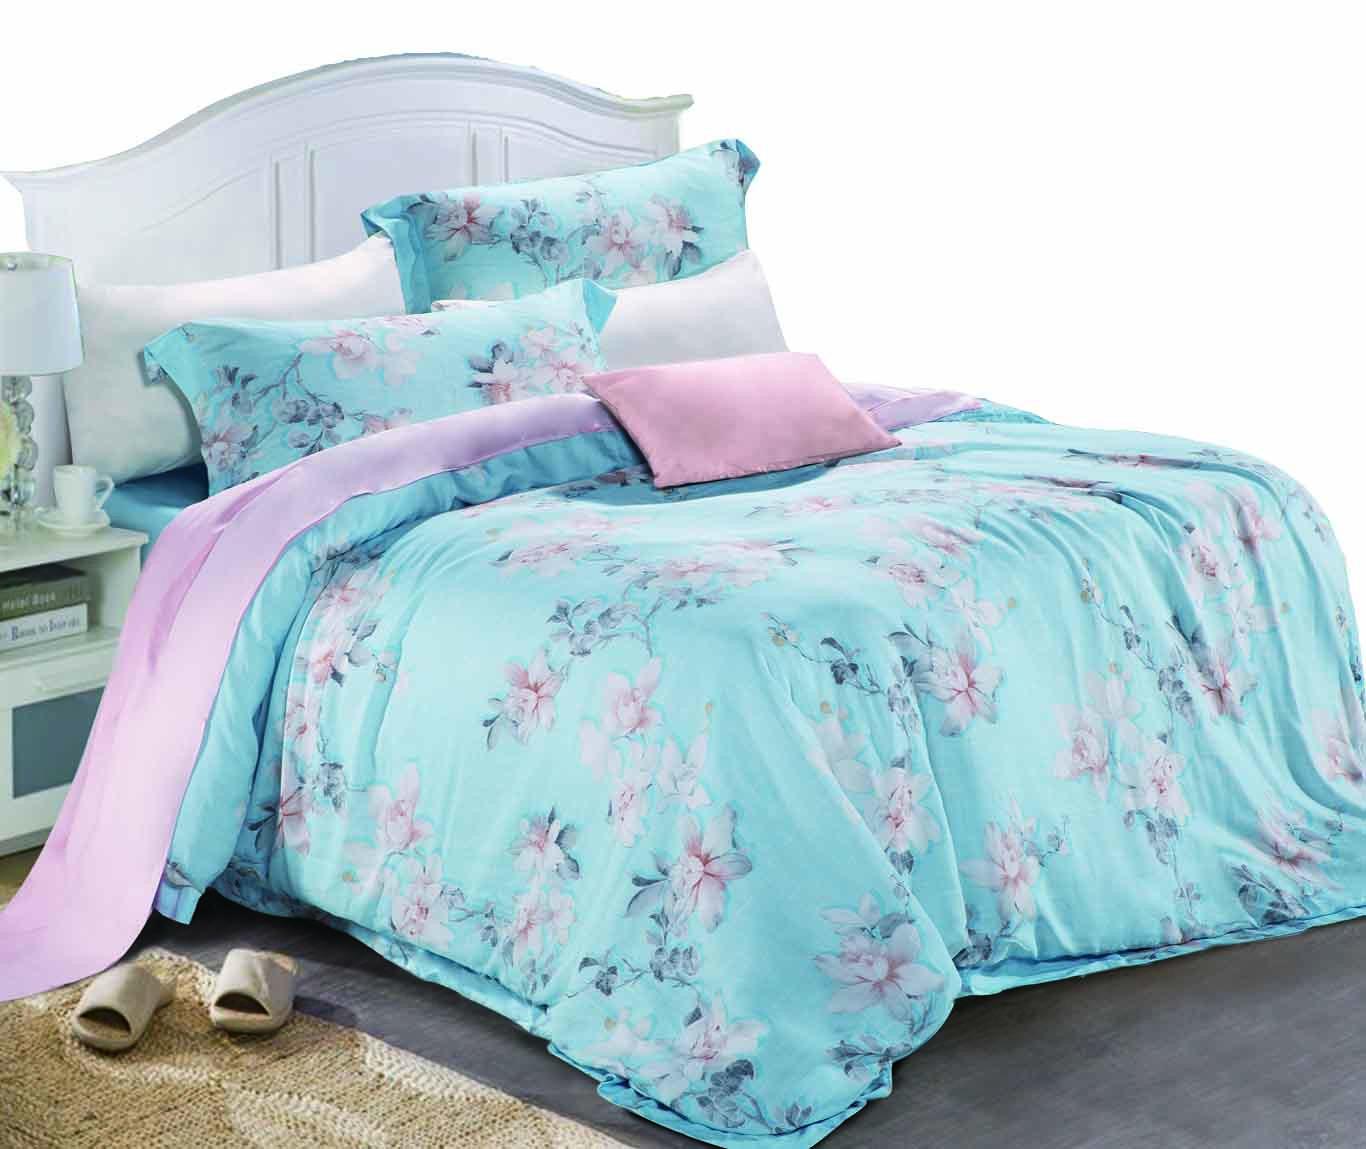 Daphne healthy modern bedding sets filamentary comforters